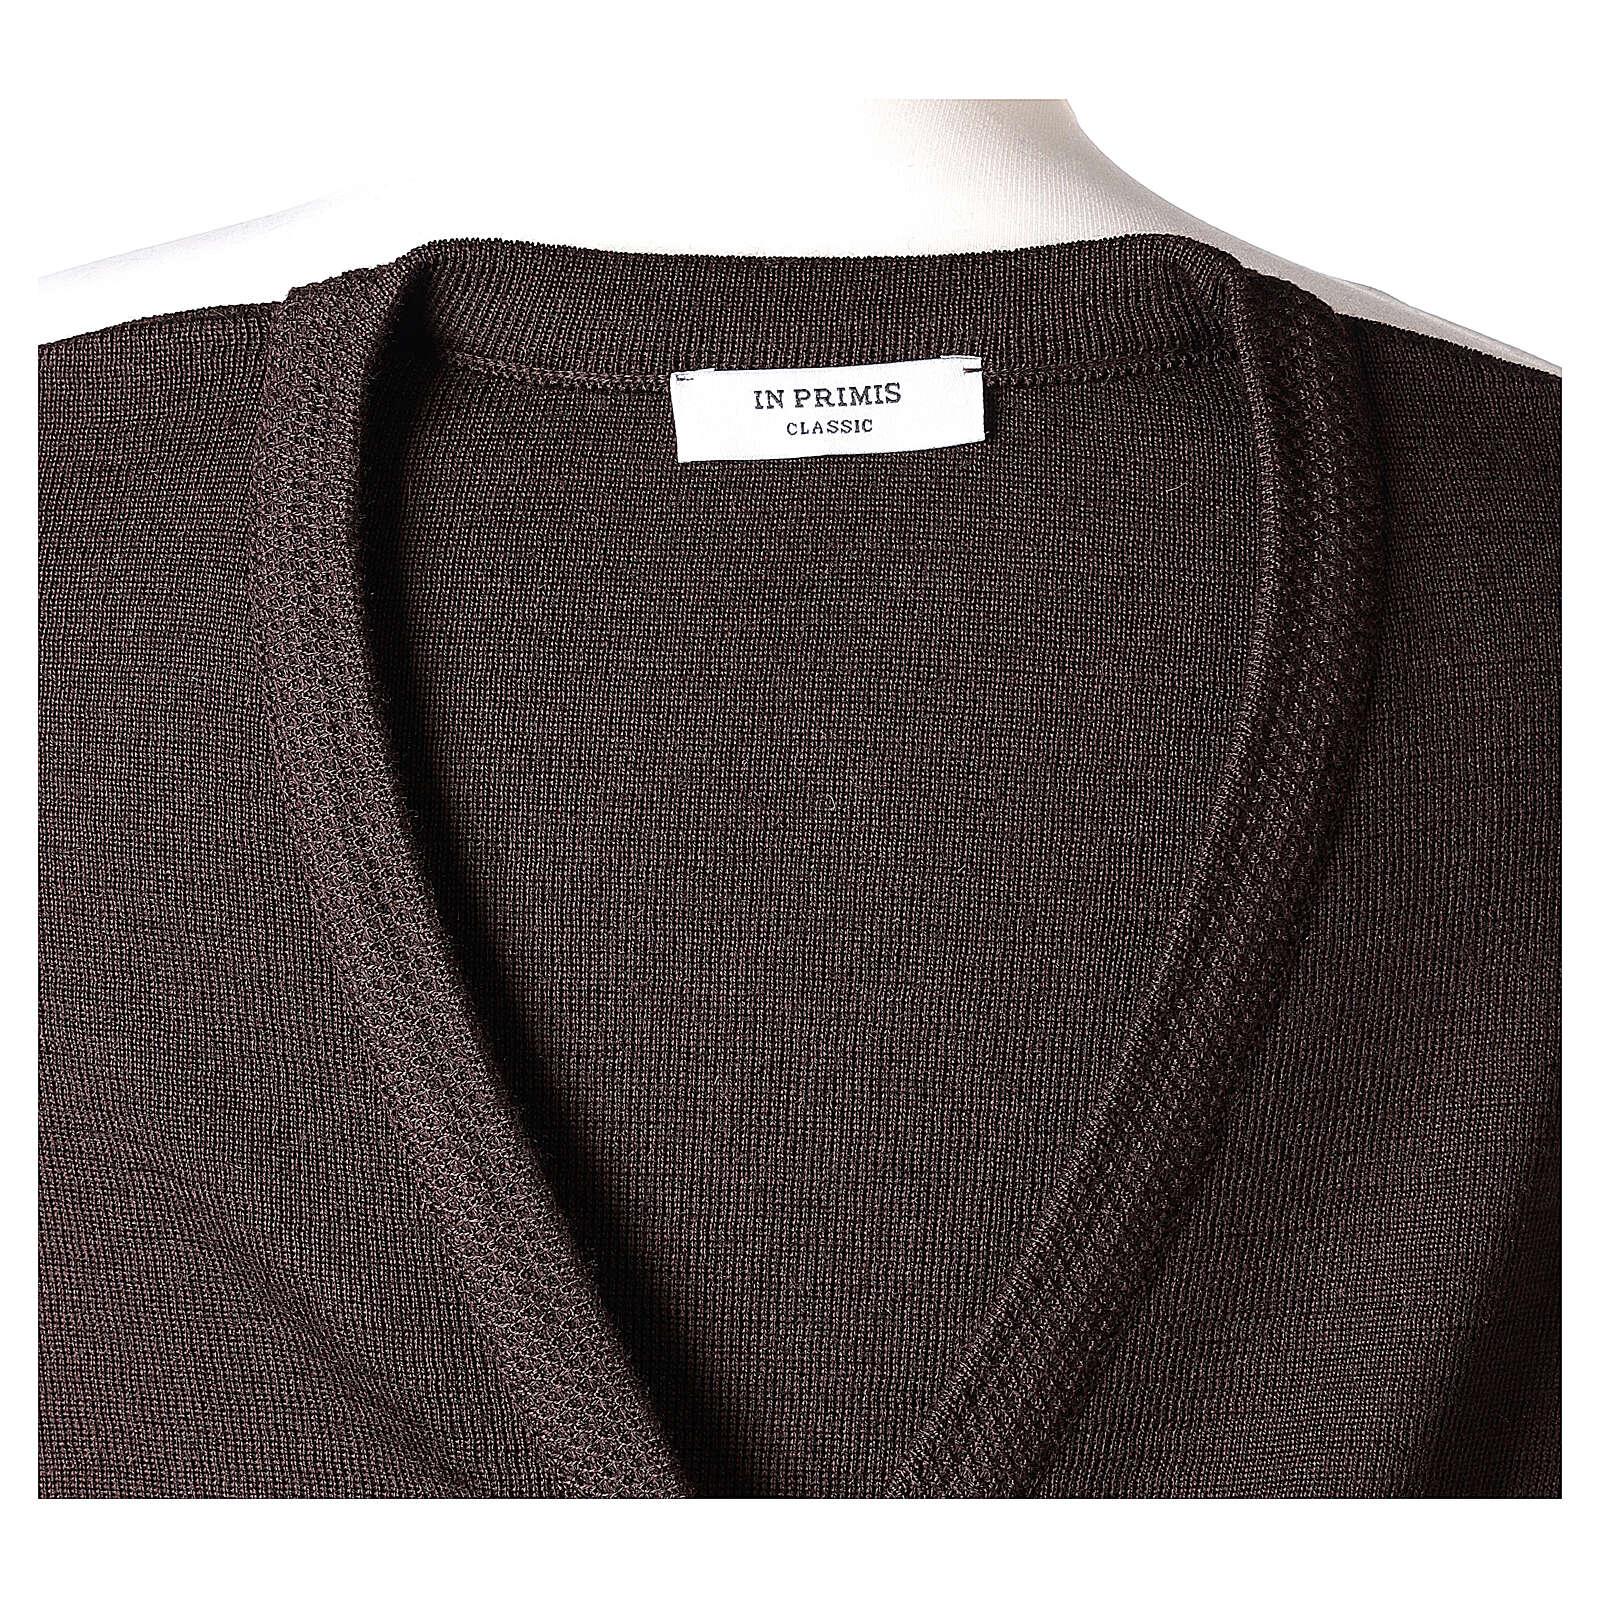 Brown V-neck nun cardigan with pockets 50% acrylic 50% merino wool In Primis 4